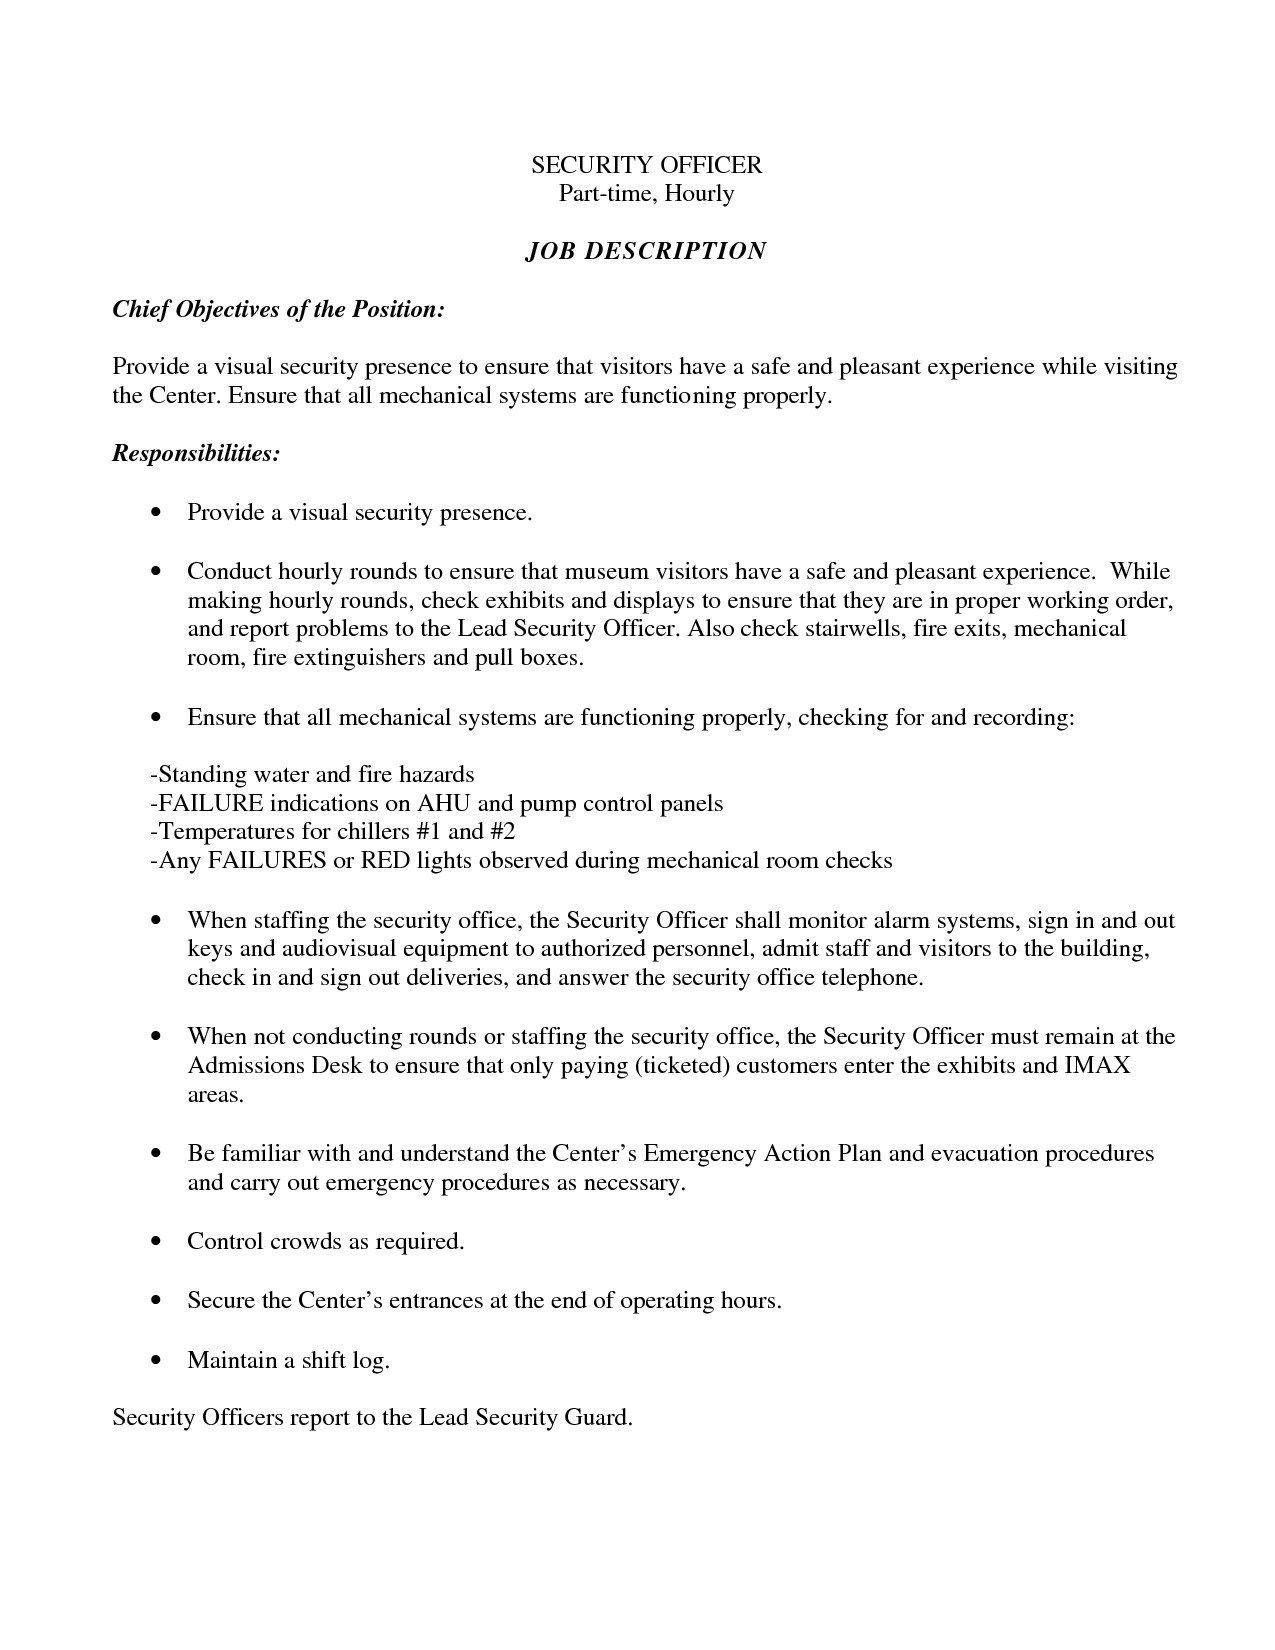 Easy Resume Tips Objective To Follow Job Resume Resume Objective Security Resume